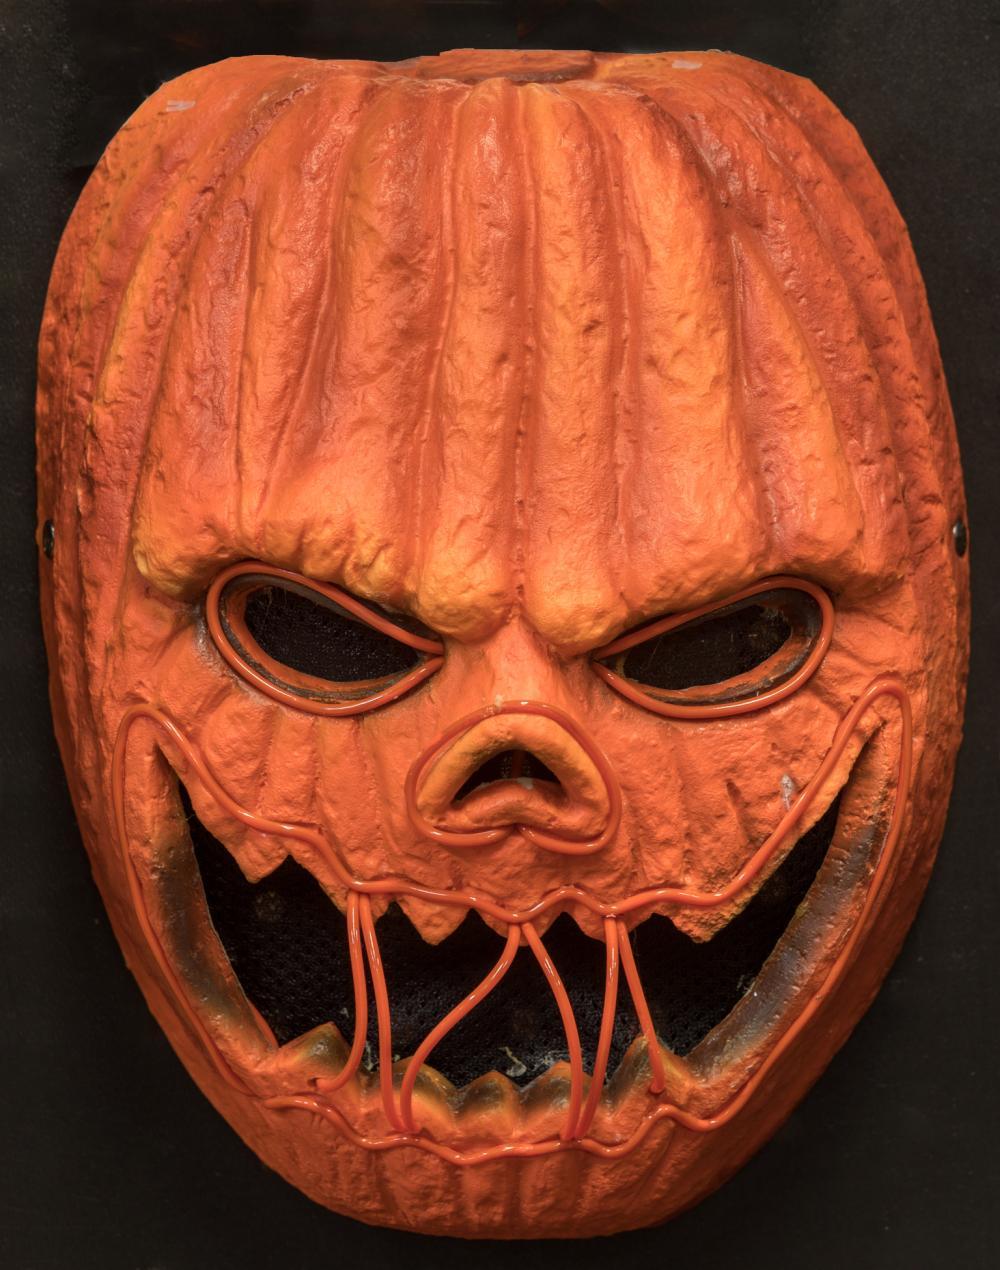 Creepy mask cool pumpkin carving ideas